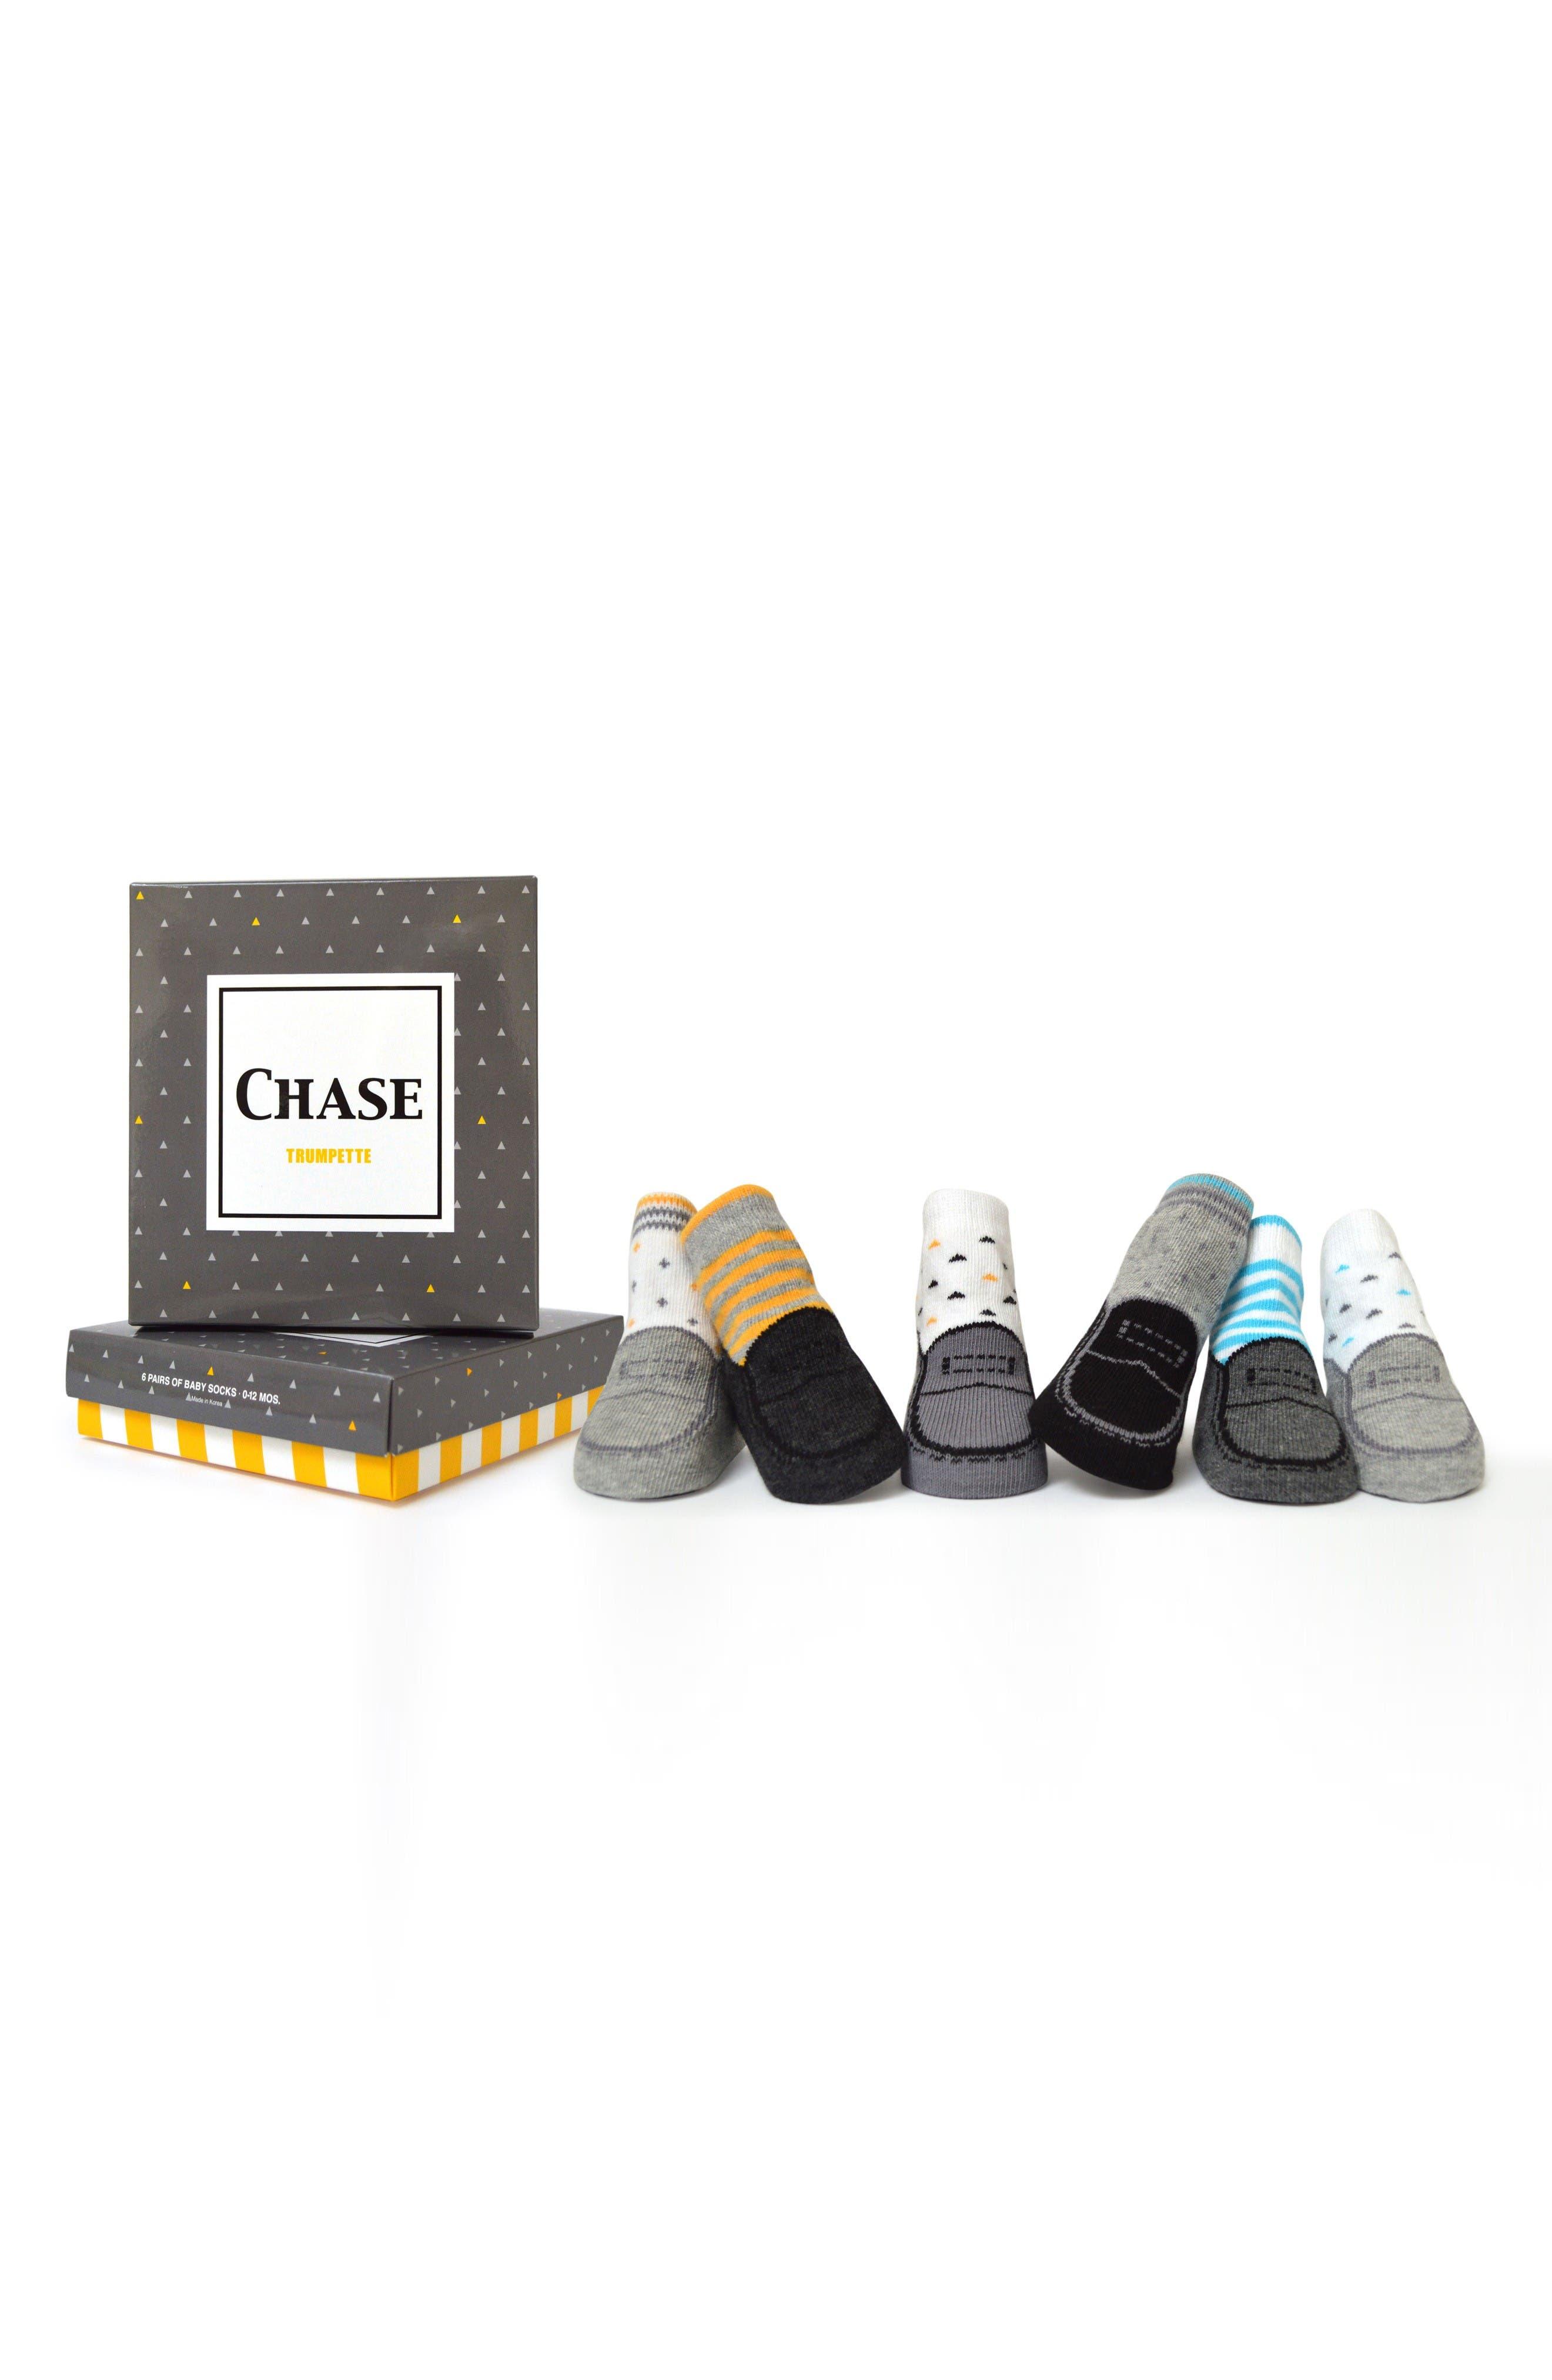 Chase 6-Pack Socks,                         Main,                         color, White